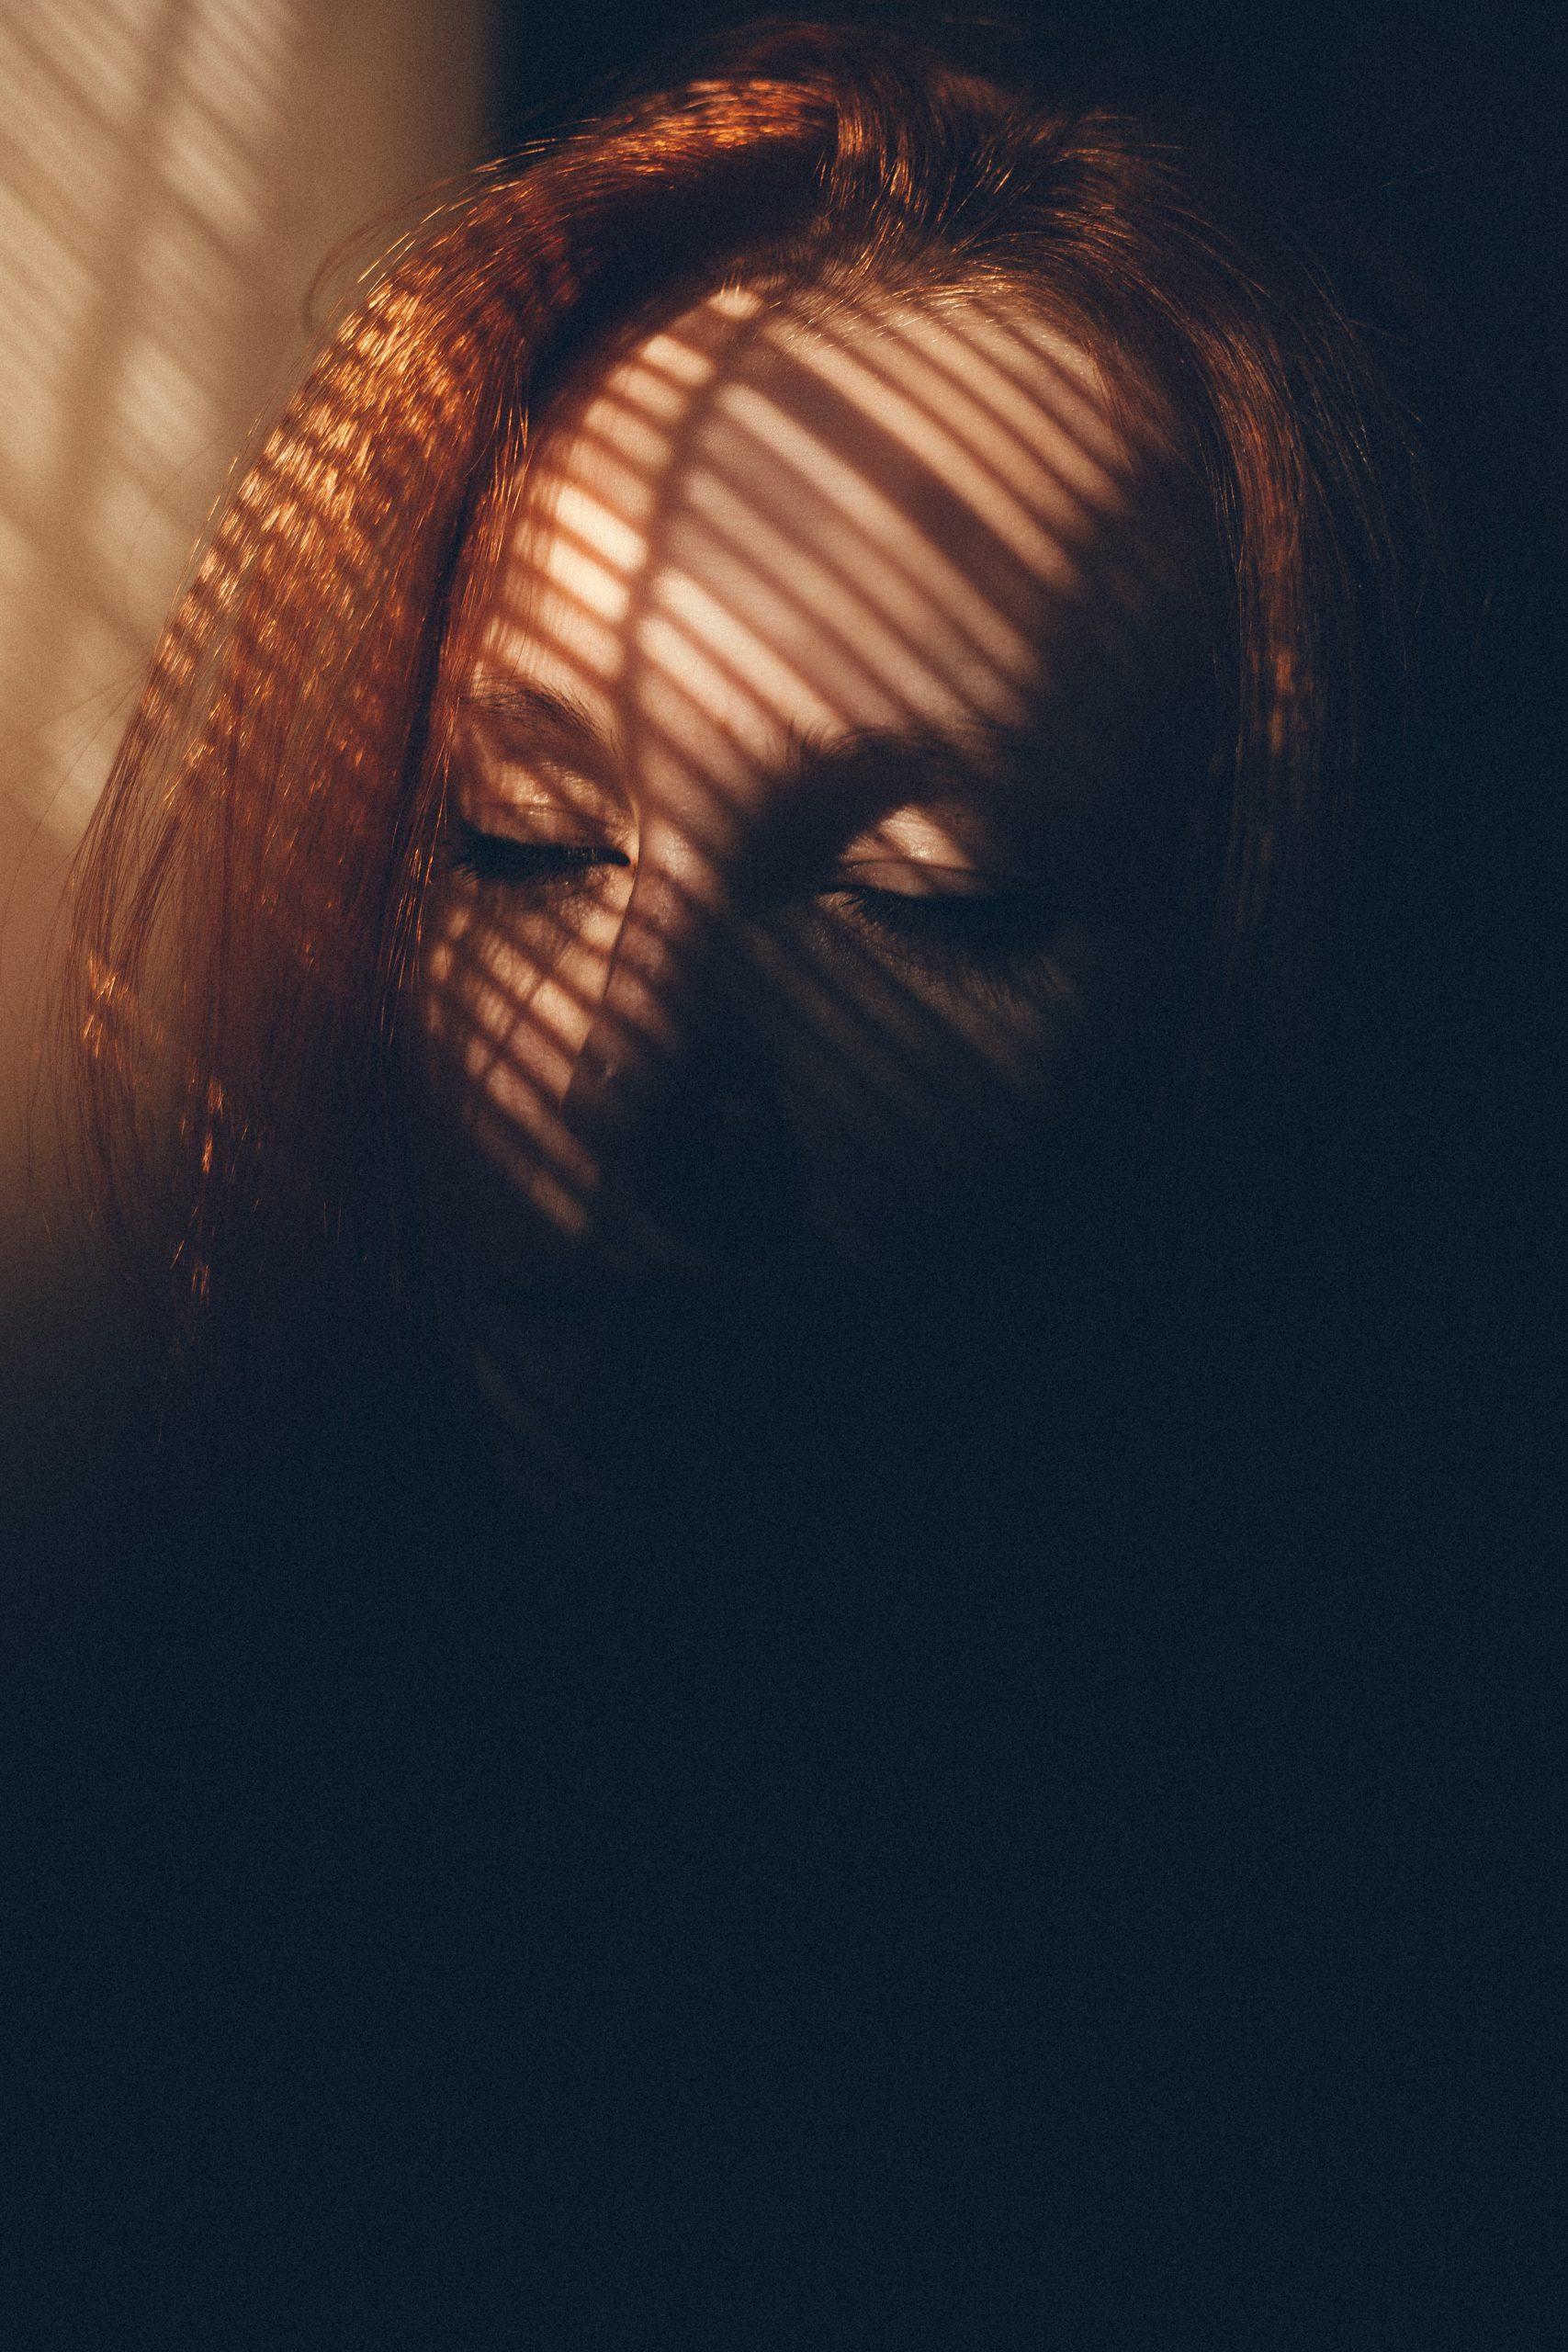 Closeup Portrait of a Girl